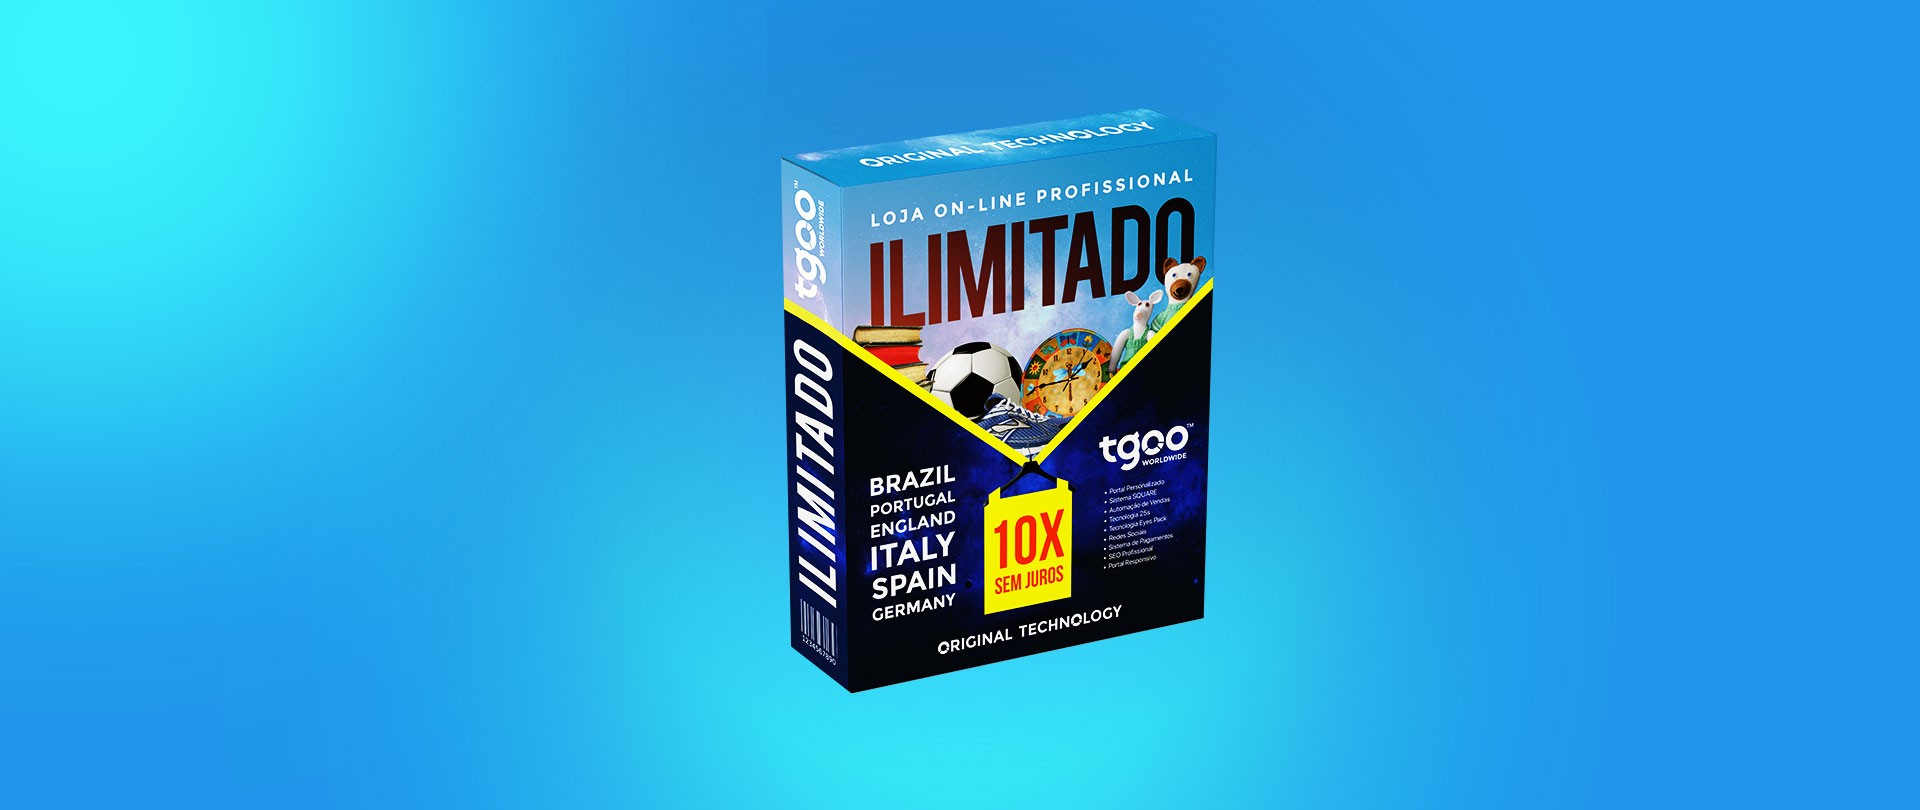 Foto: Pacote de Tecnologias Ilimitado com layout personalizado